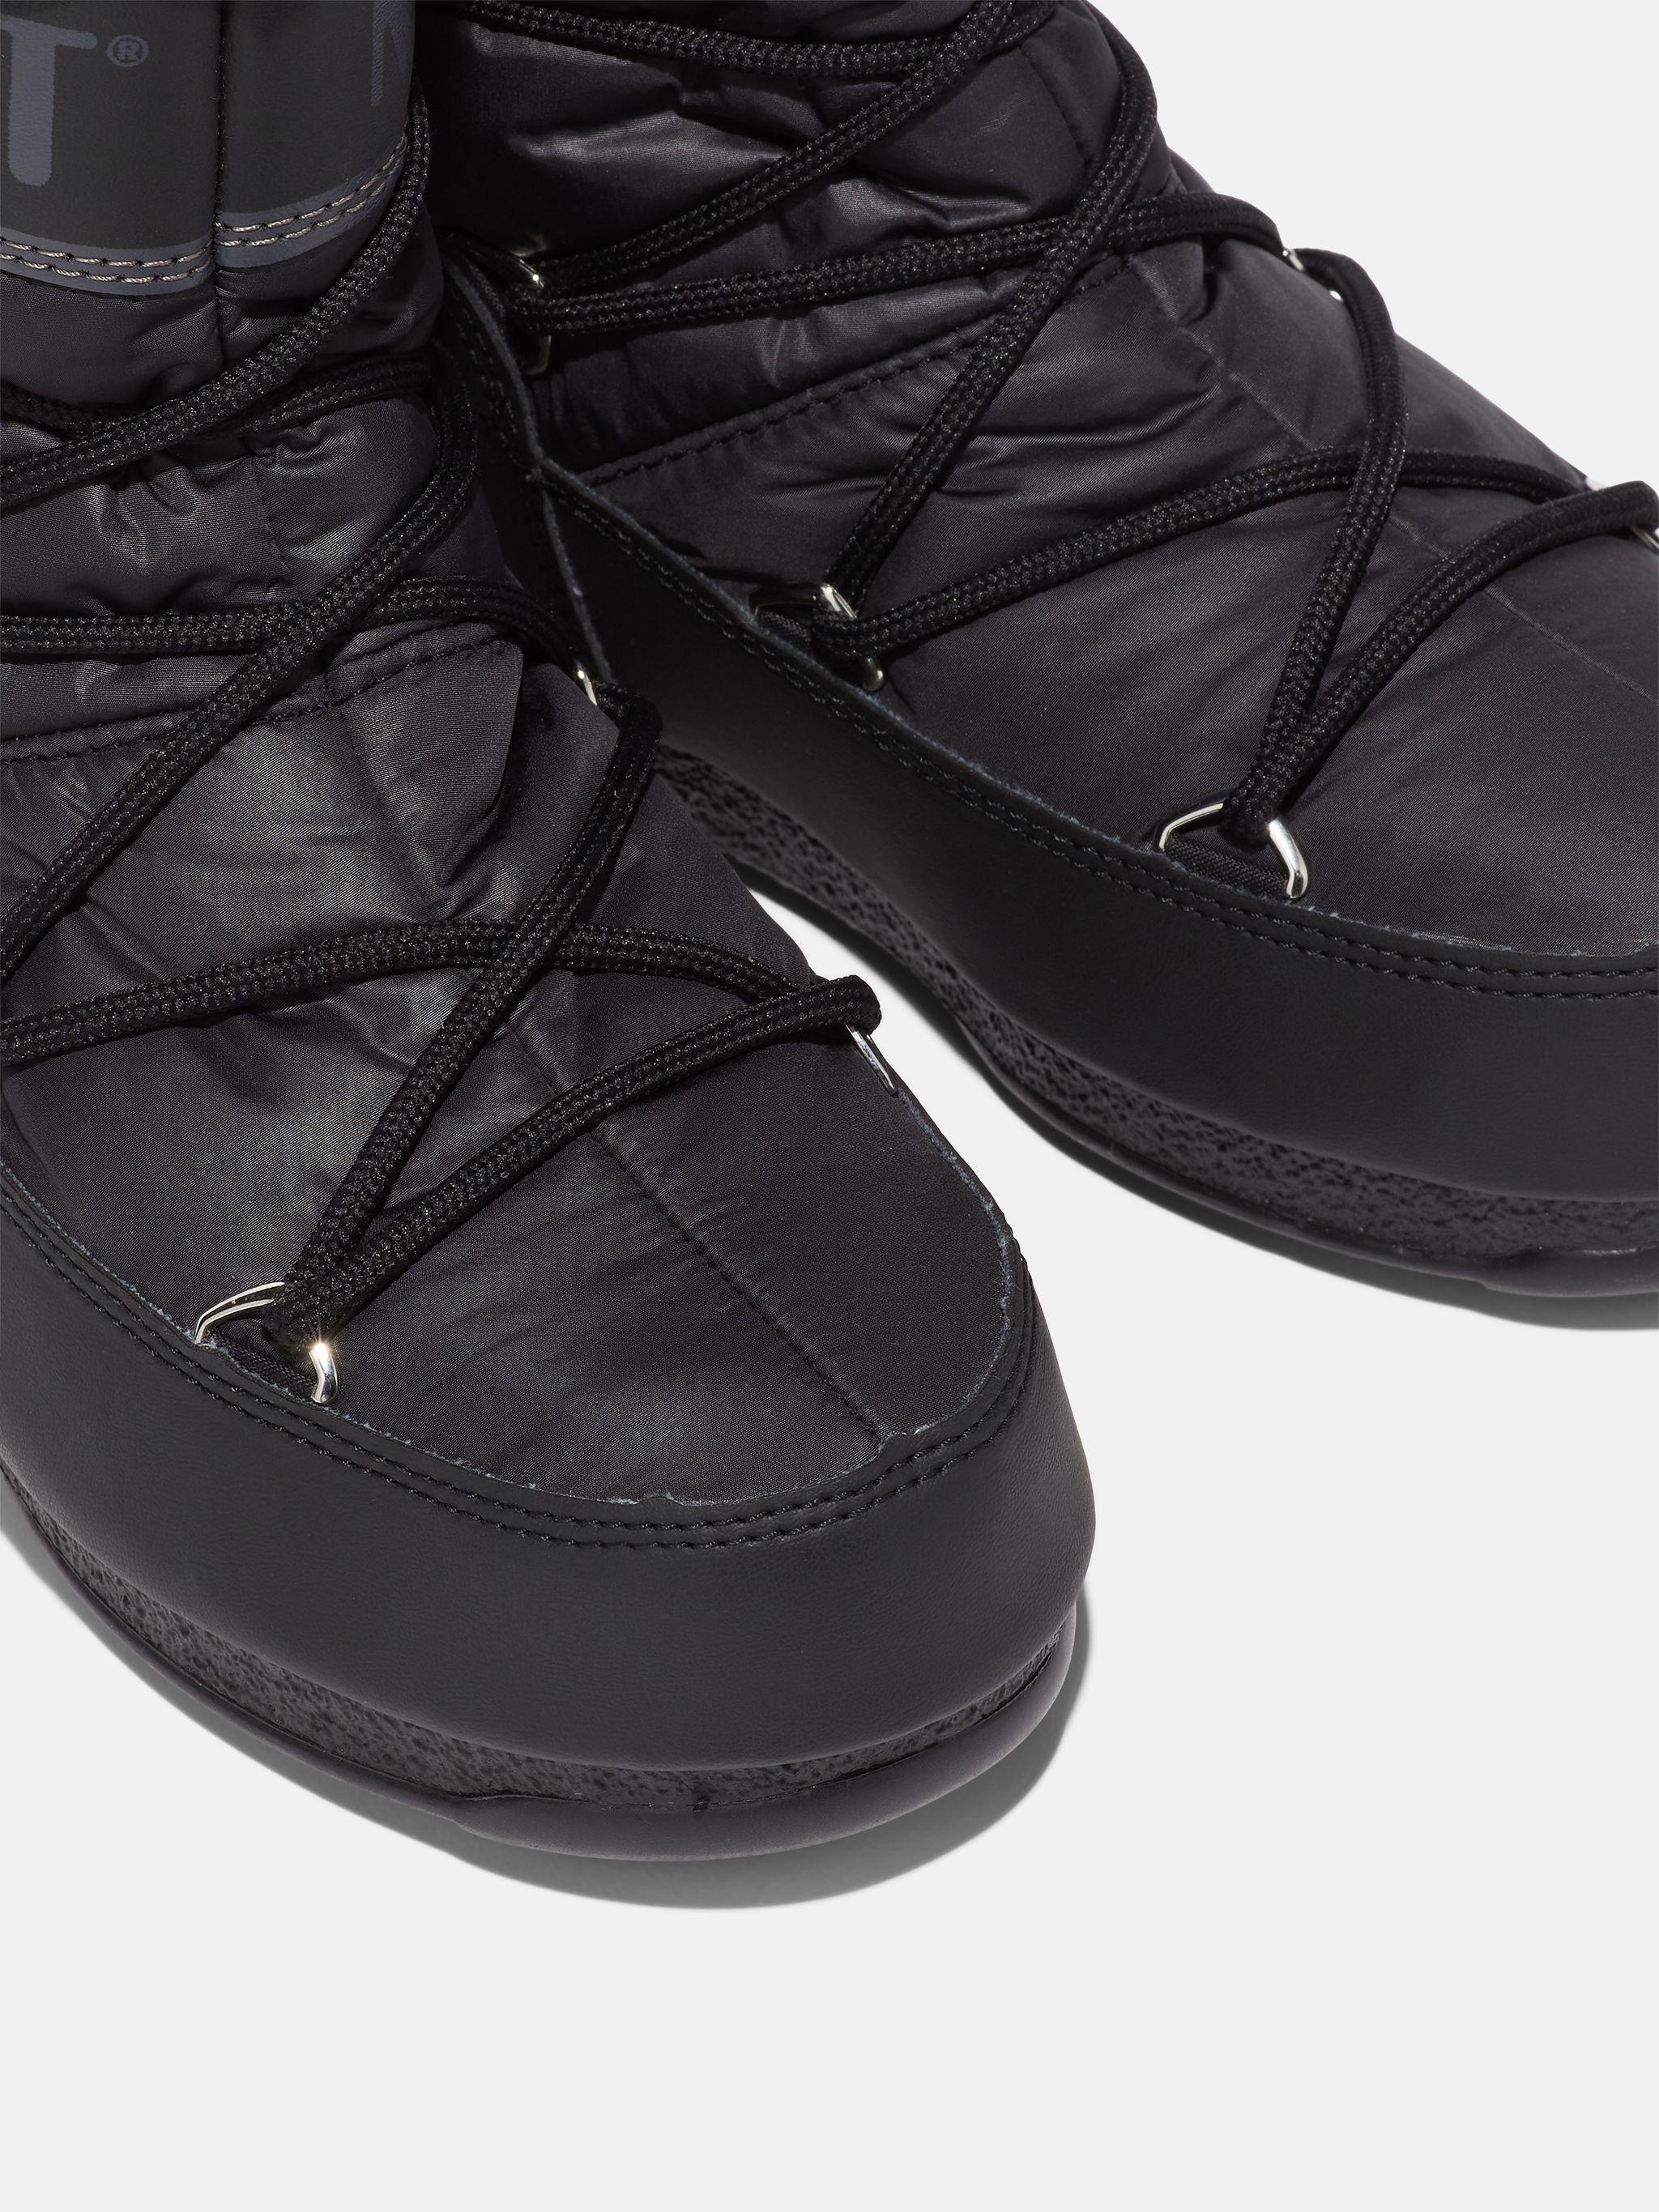 BOTTES PROTECHT MID BLACK